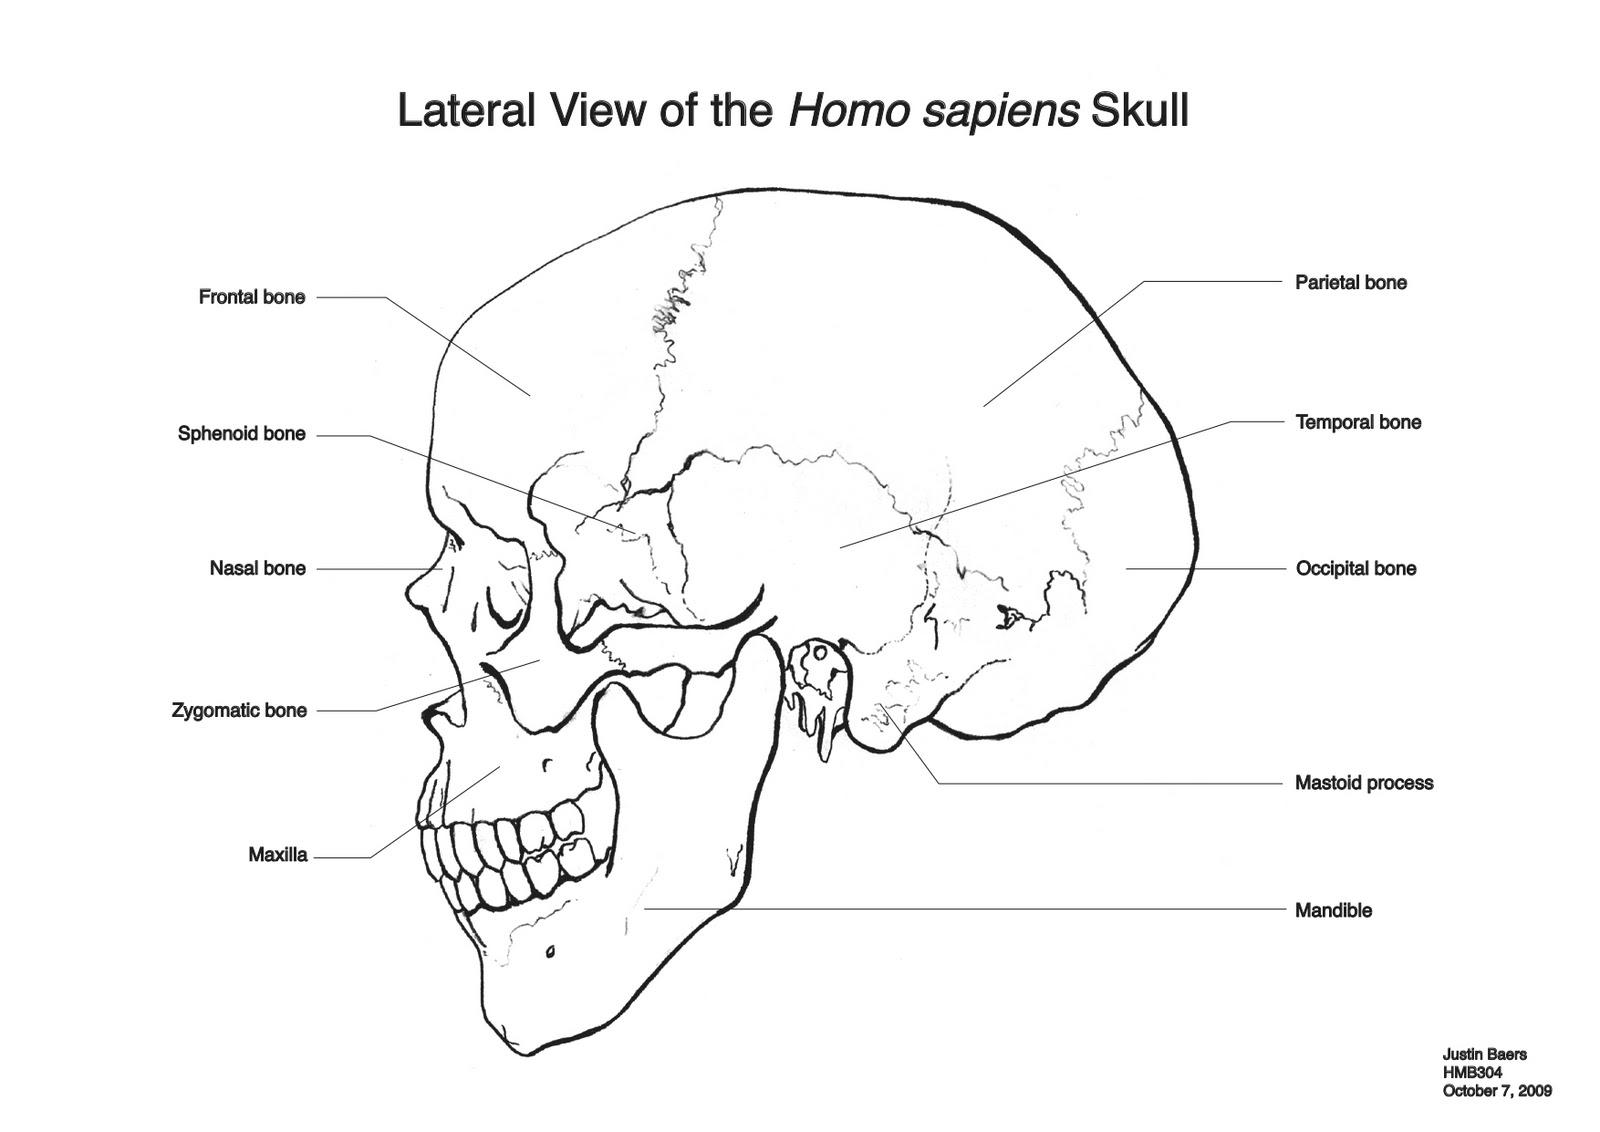 Strange Nostalgia For The Future Lateral View Of The Homo